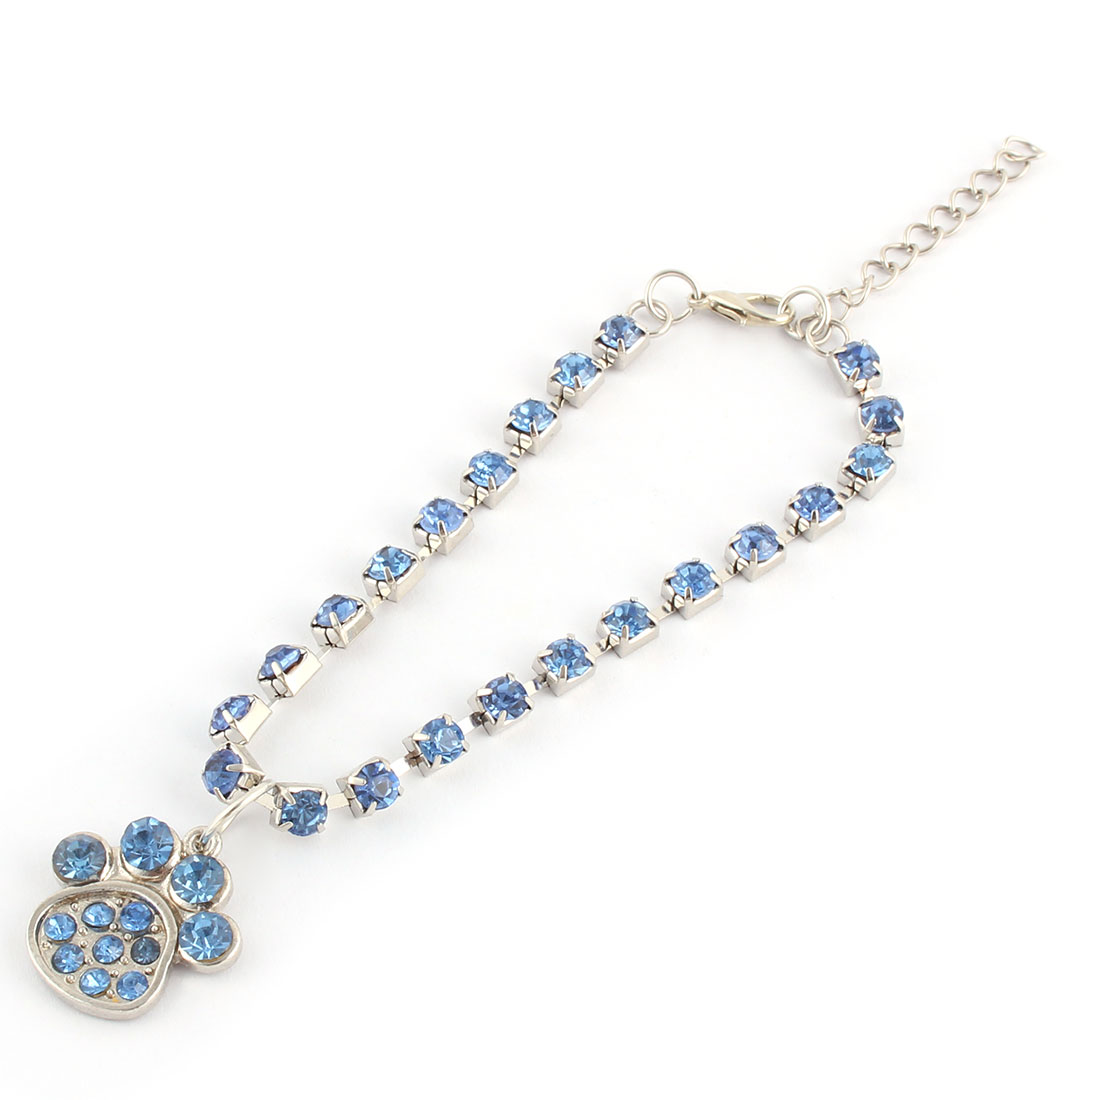 Wedding Pet Rhinestone Mosaic Metal Paw Pendent Decor Pet Necklace Bracelet Blue